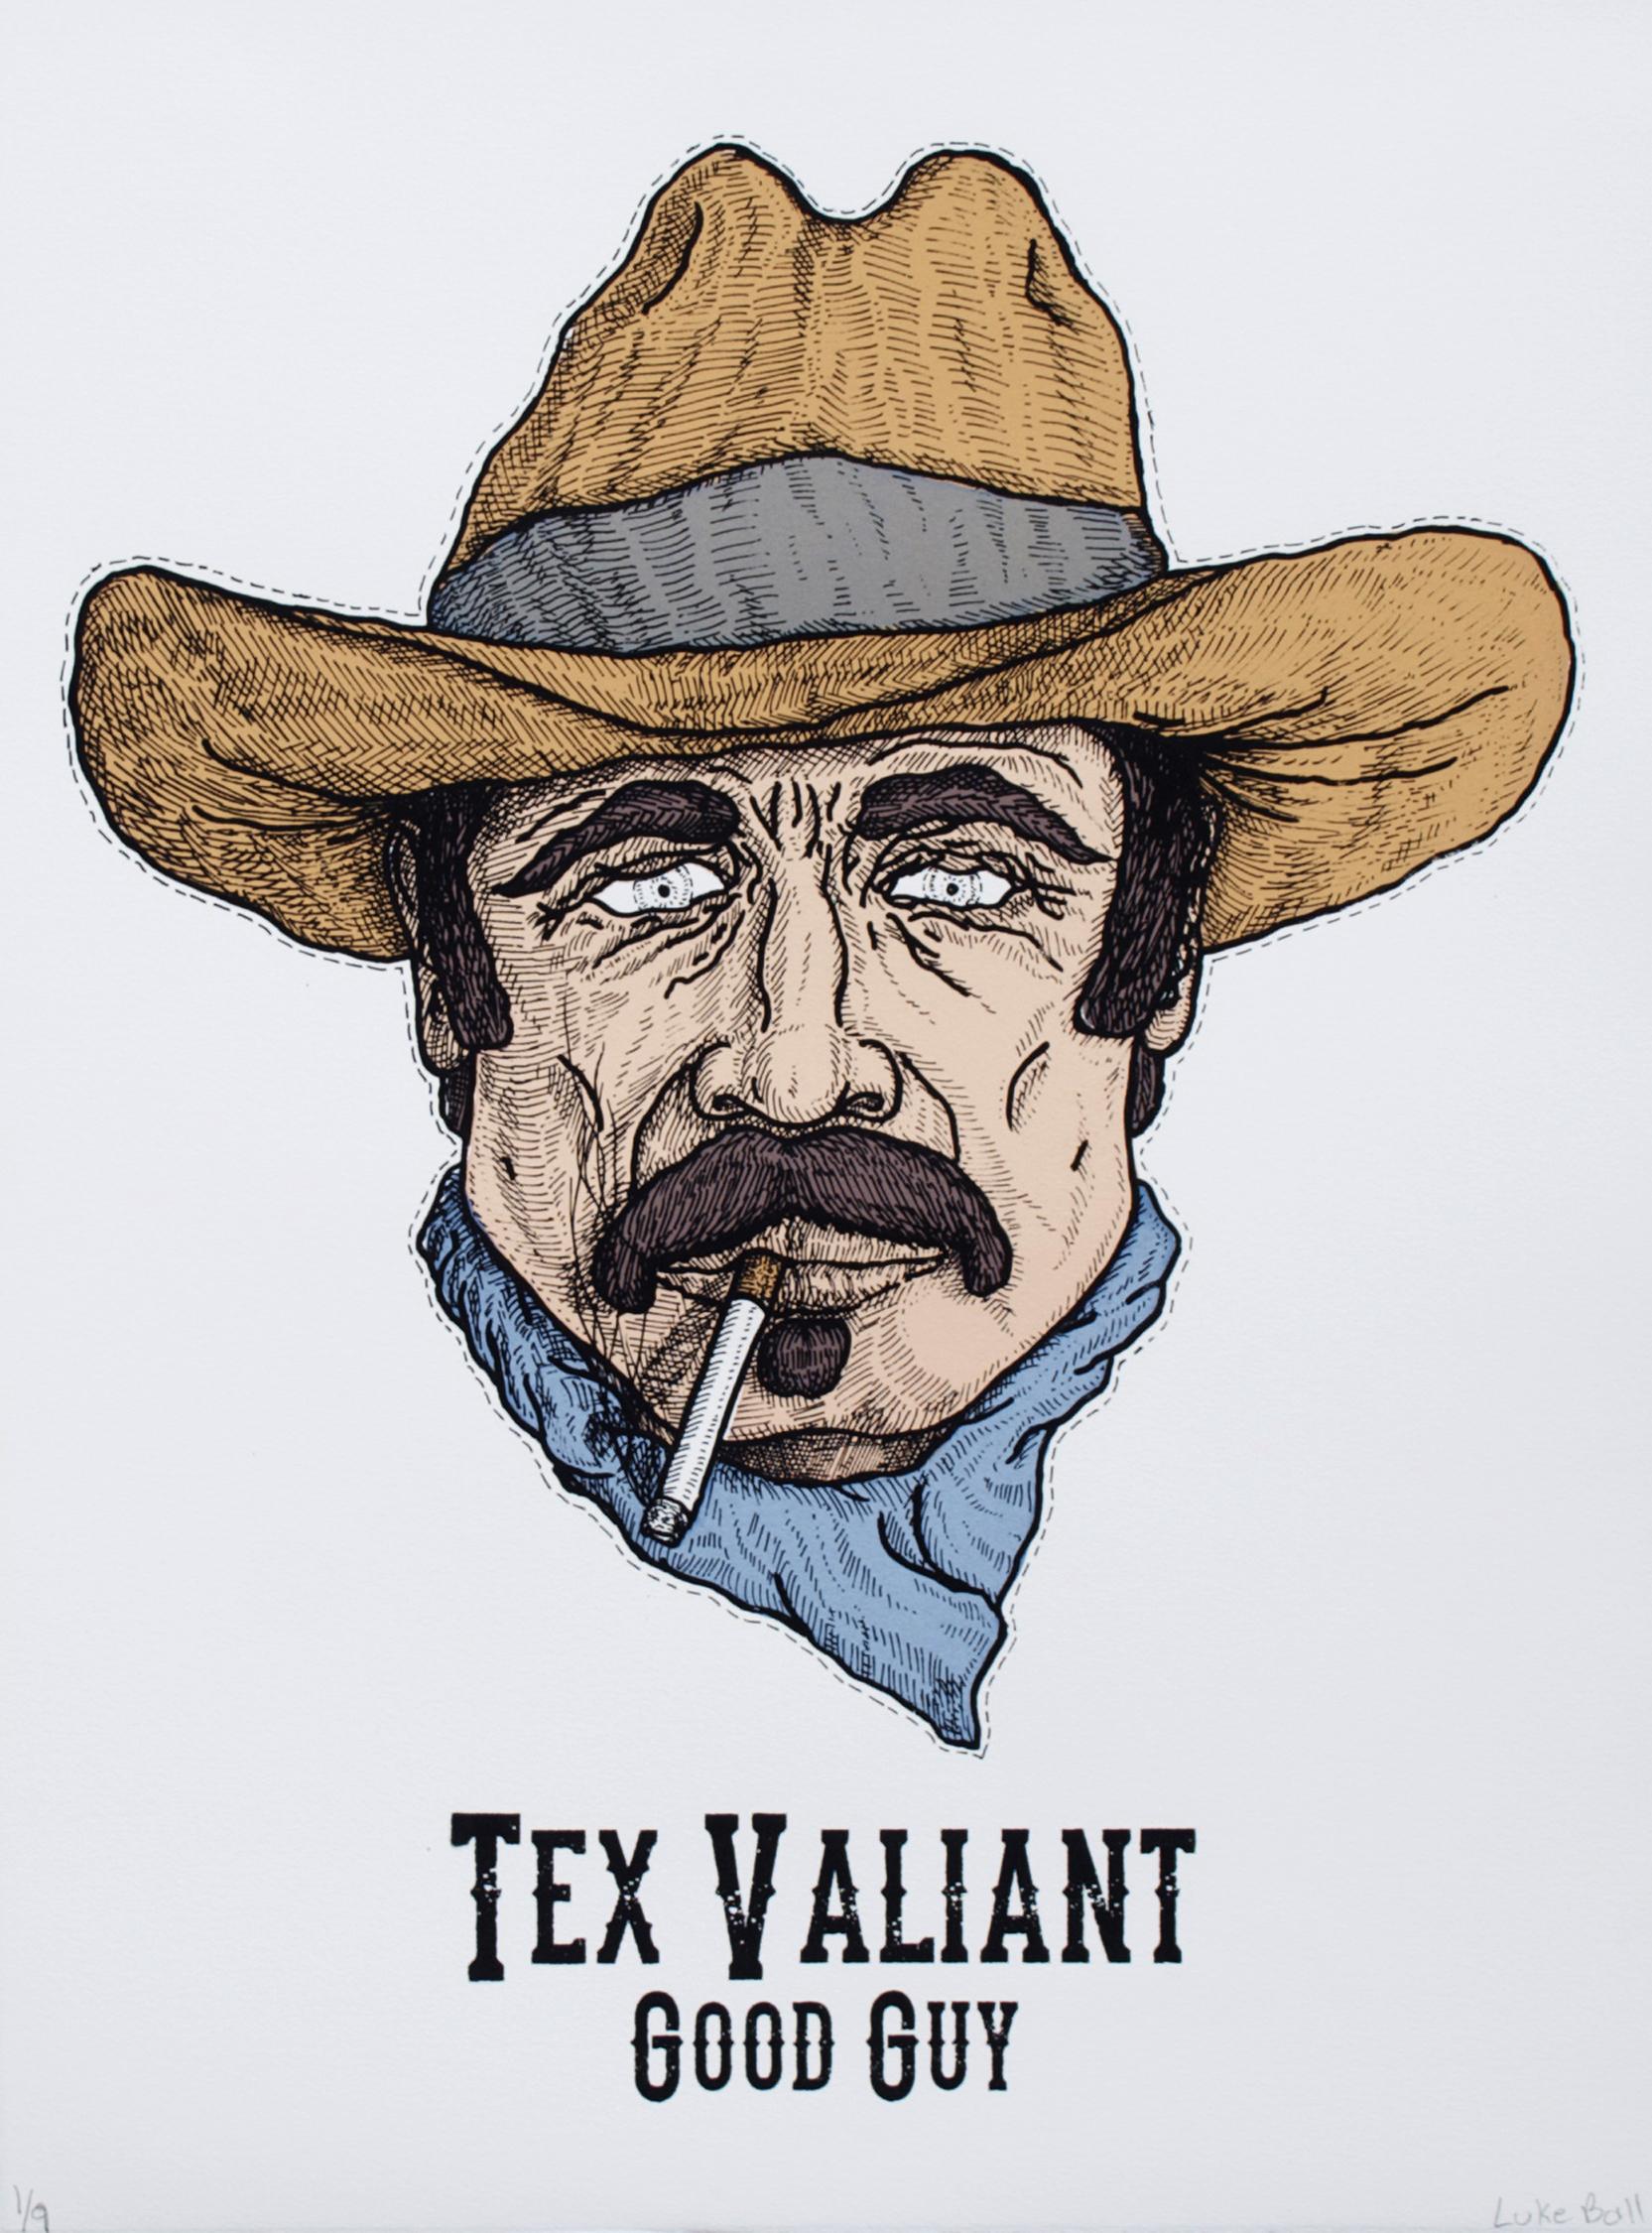 Tex Valiant